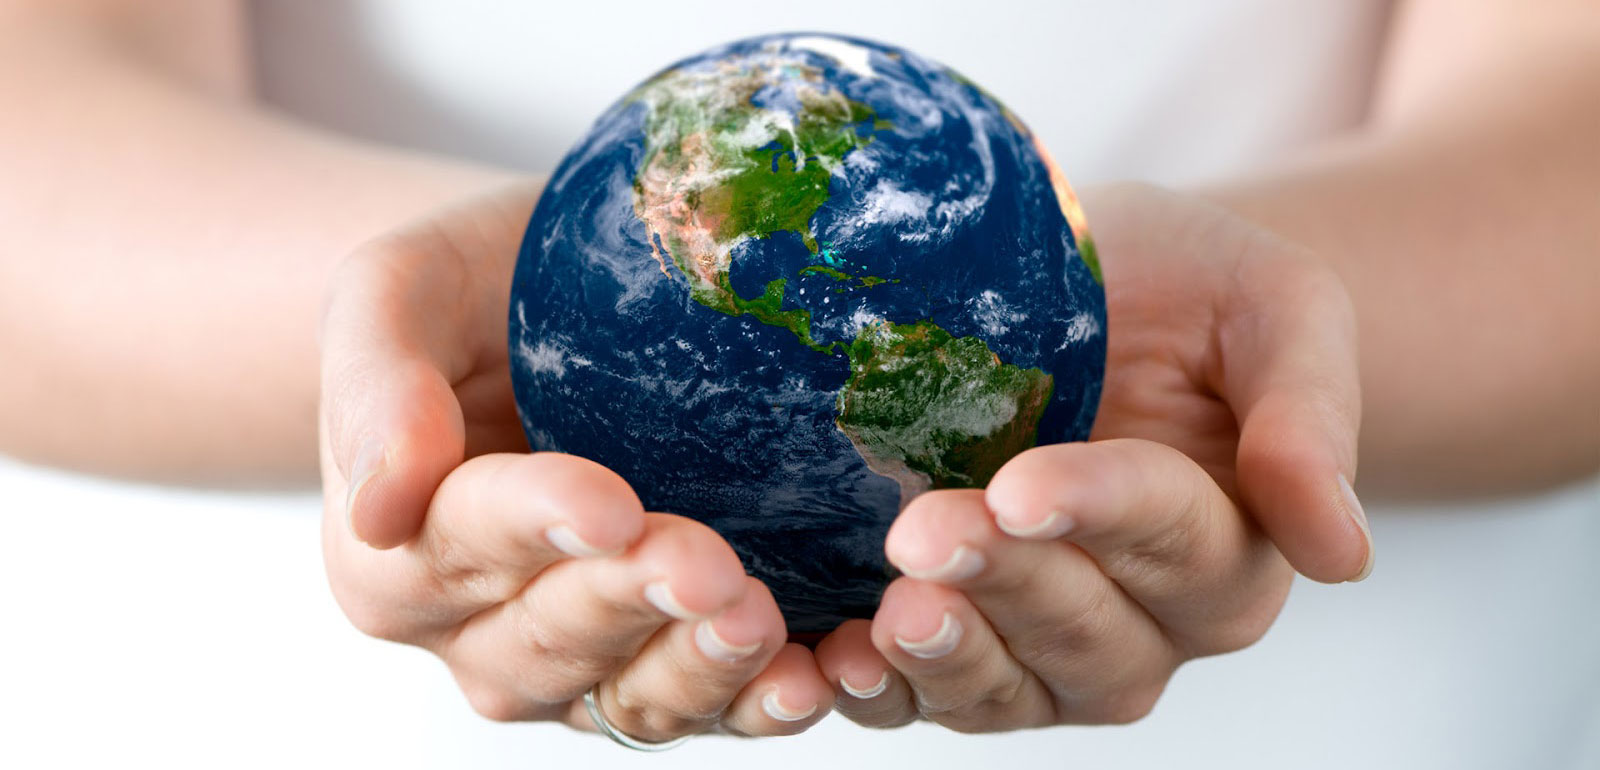 earthlings unite essay